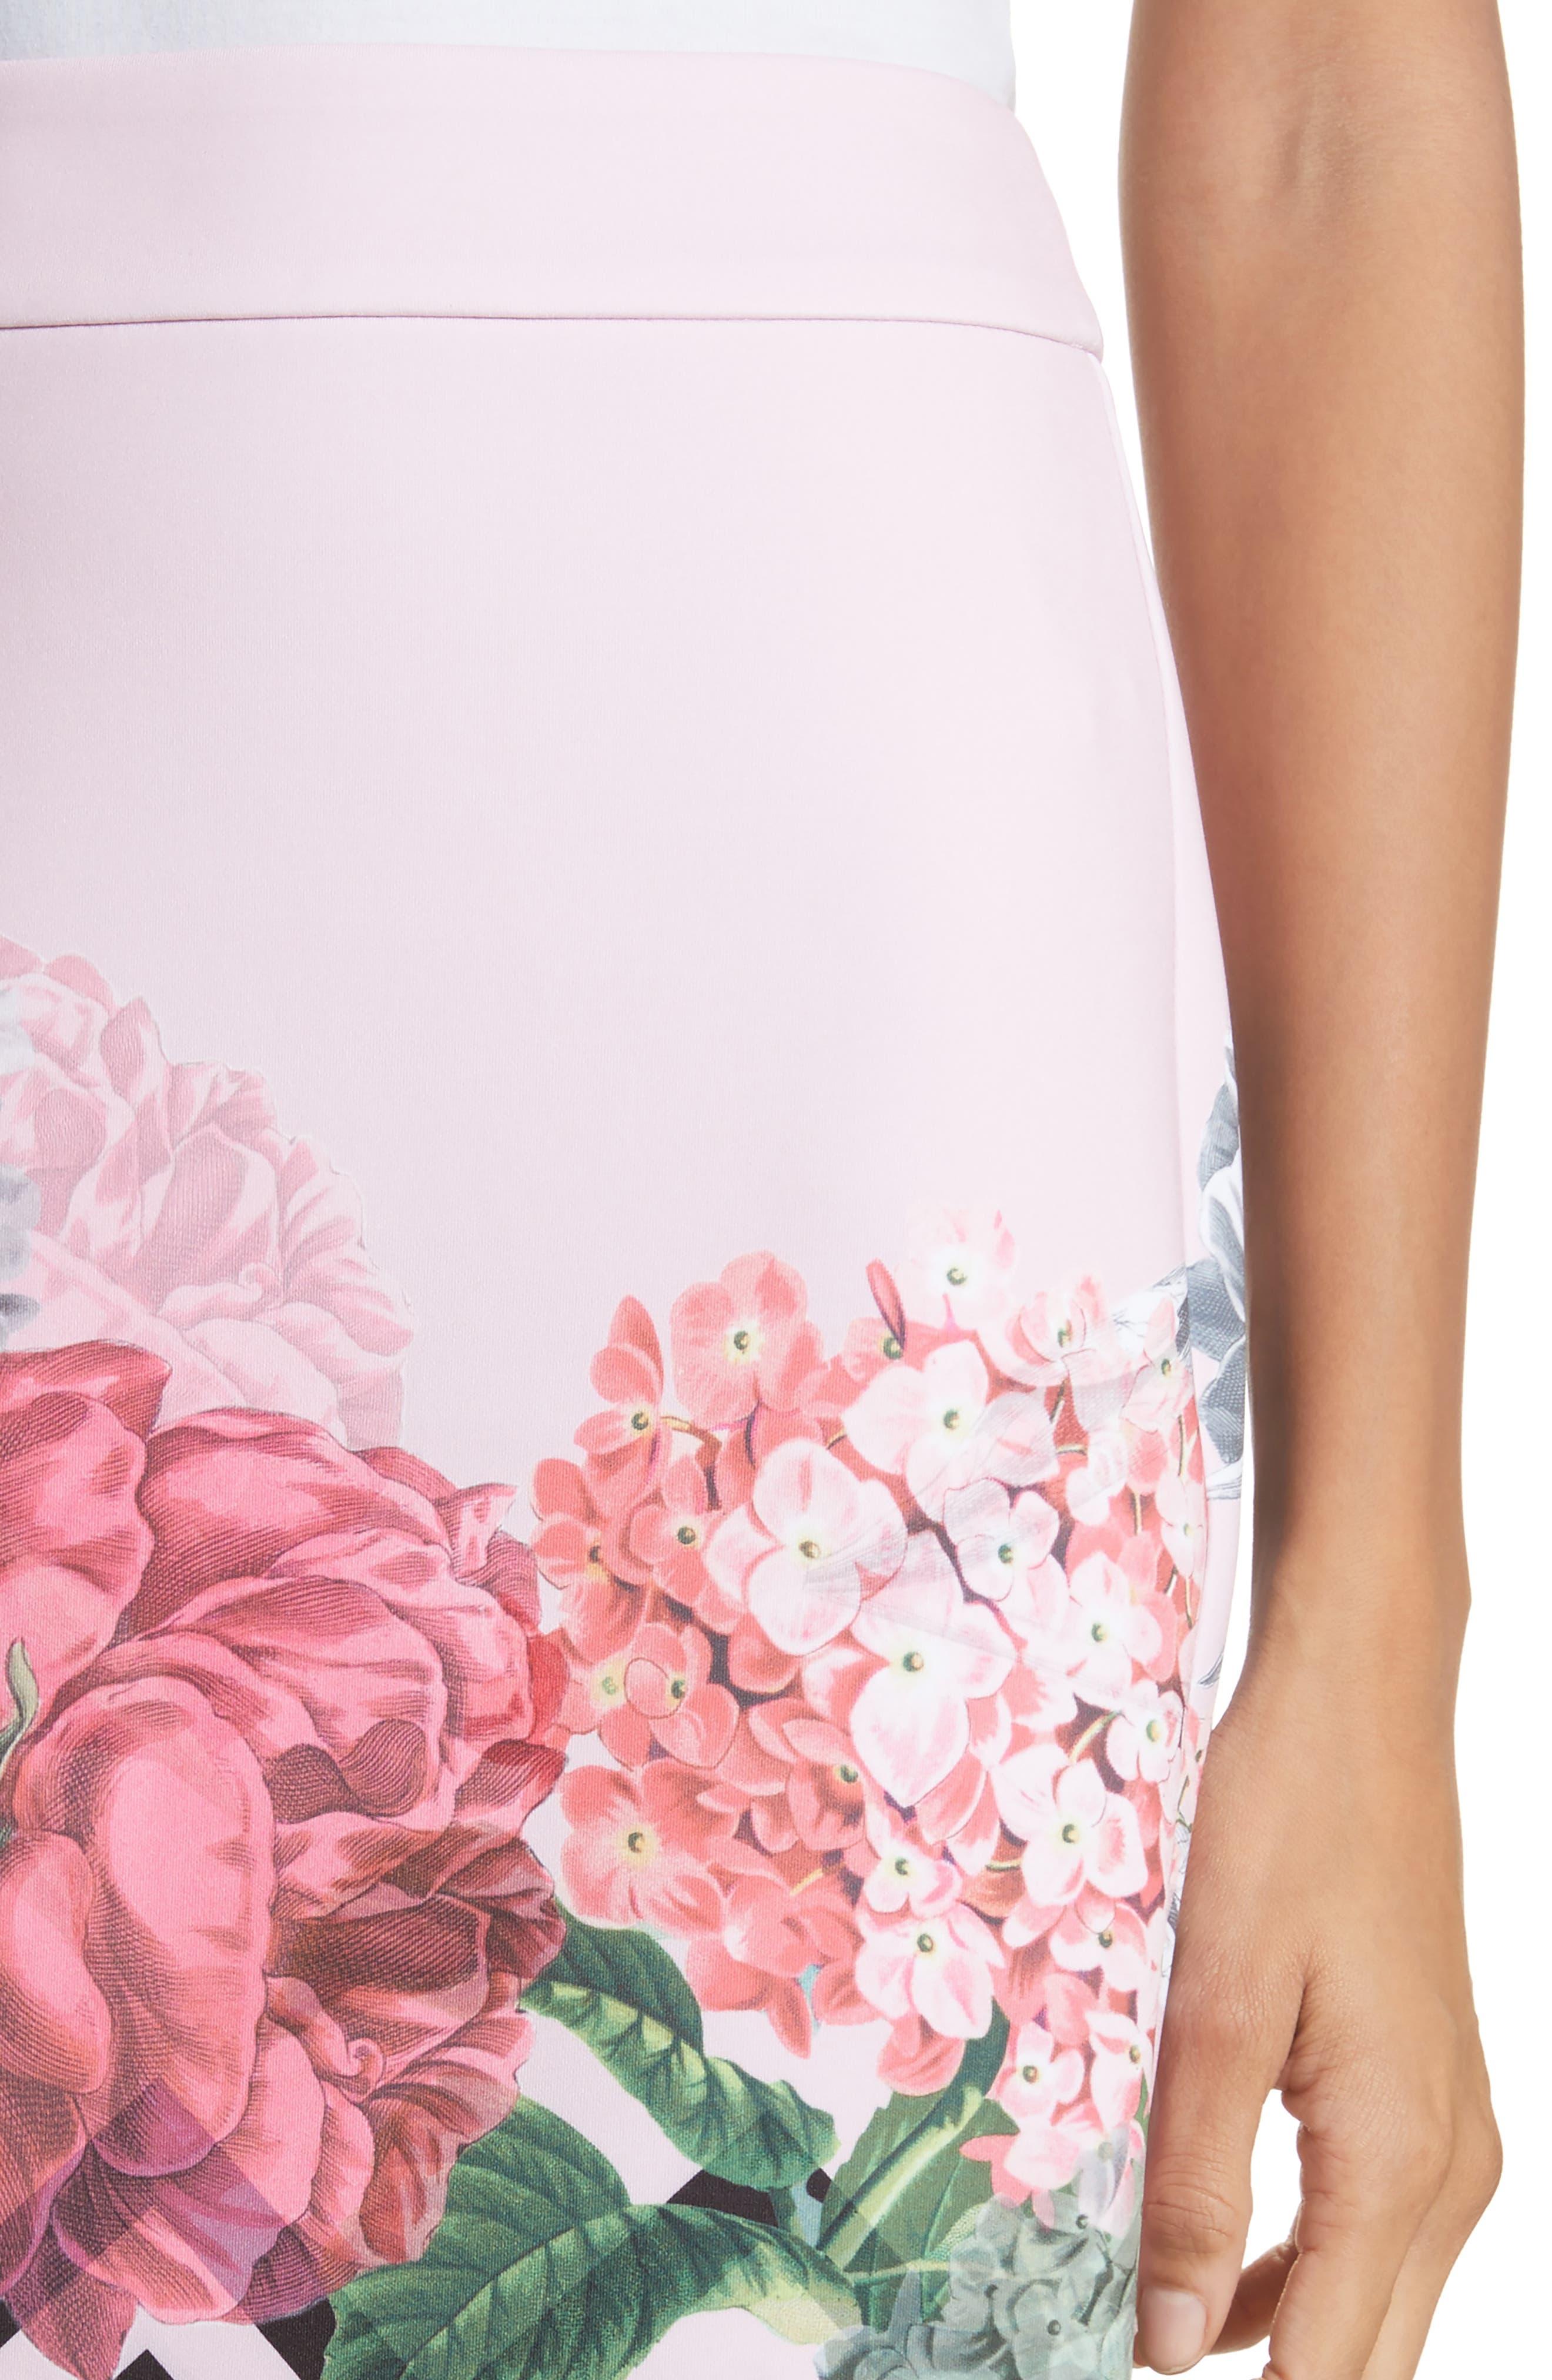 Soella Pencil Skirt,                             Alternate thumbnail 4, color,                             680